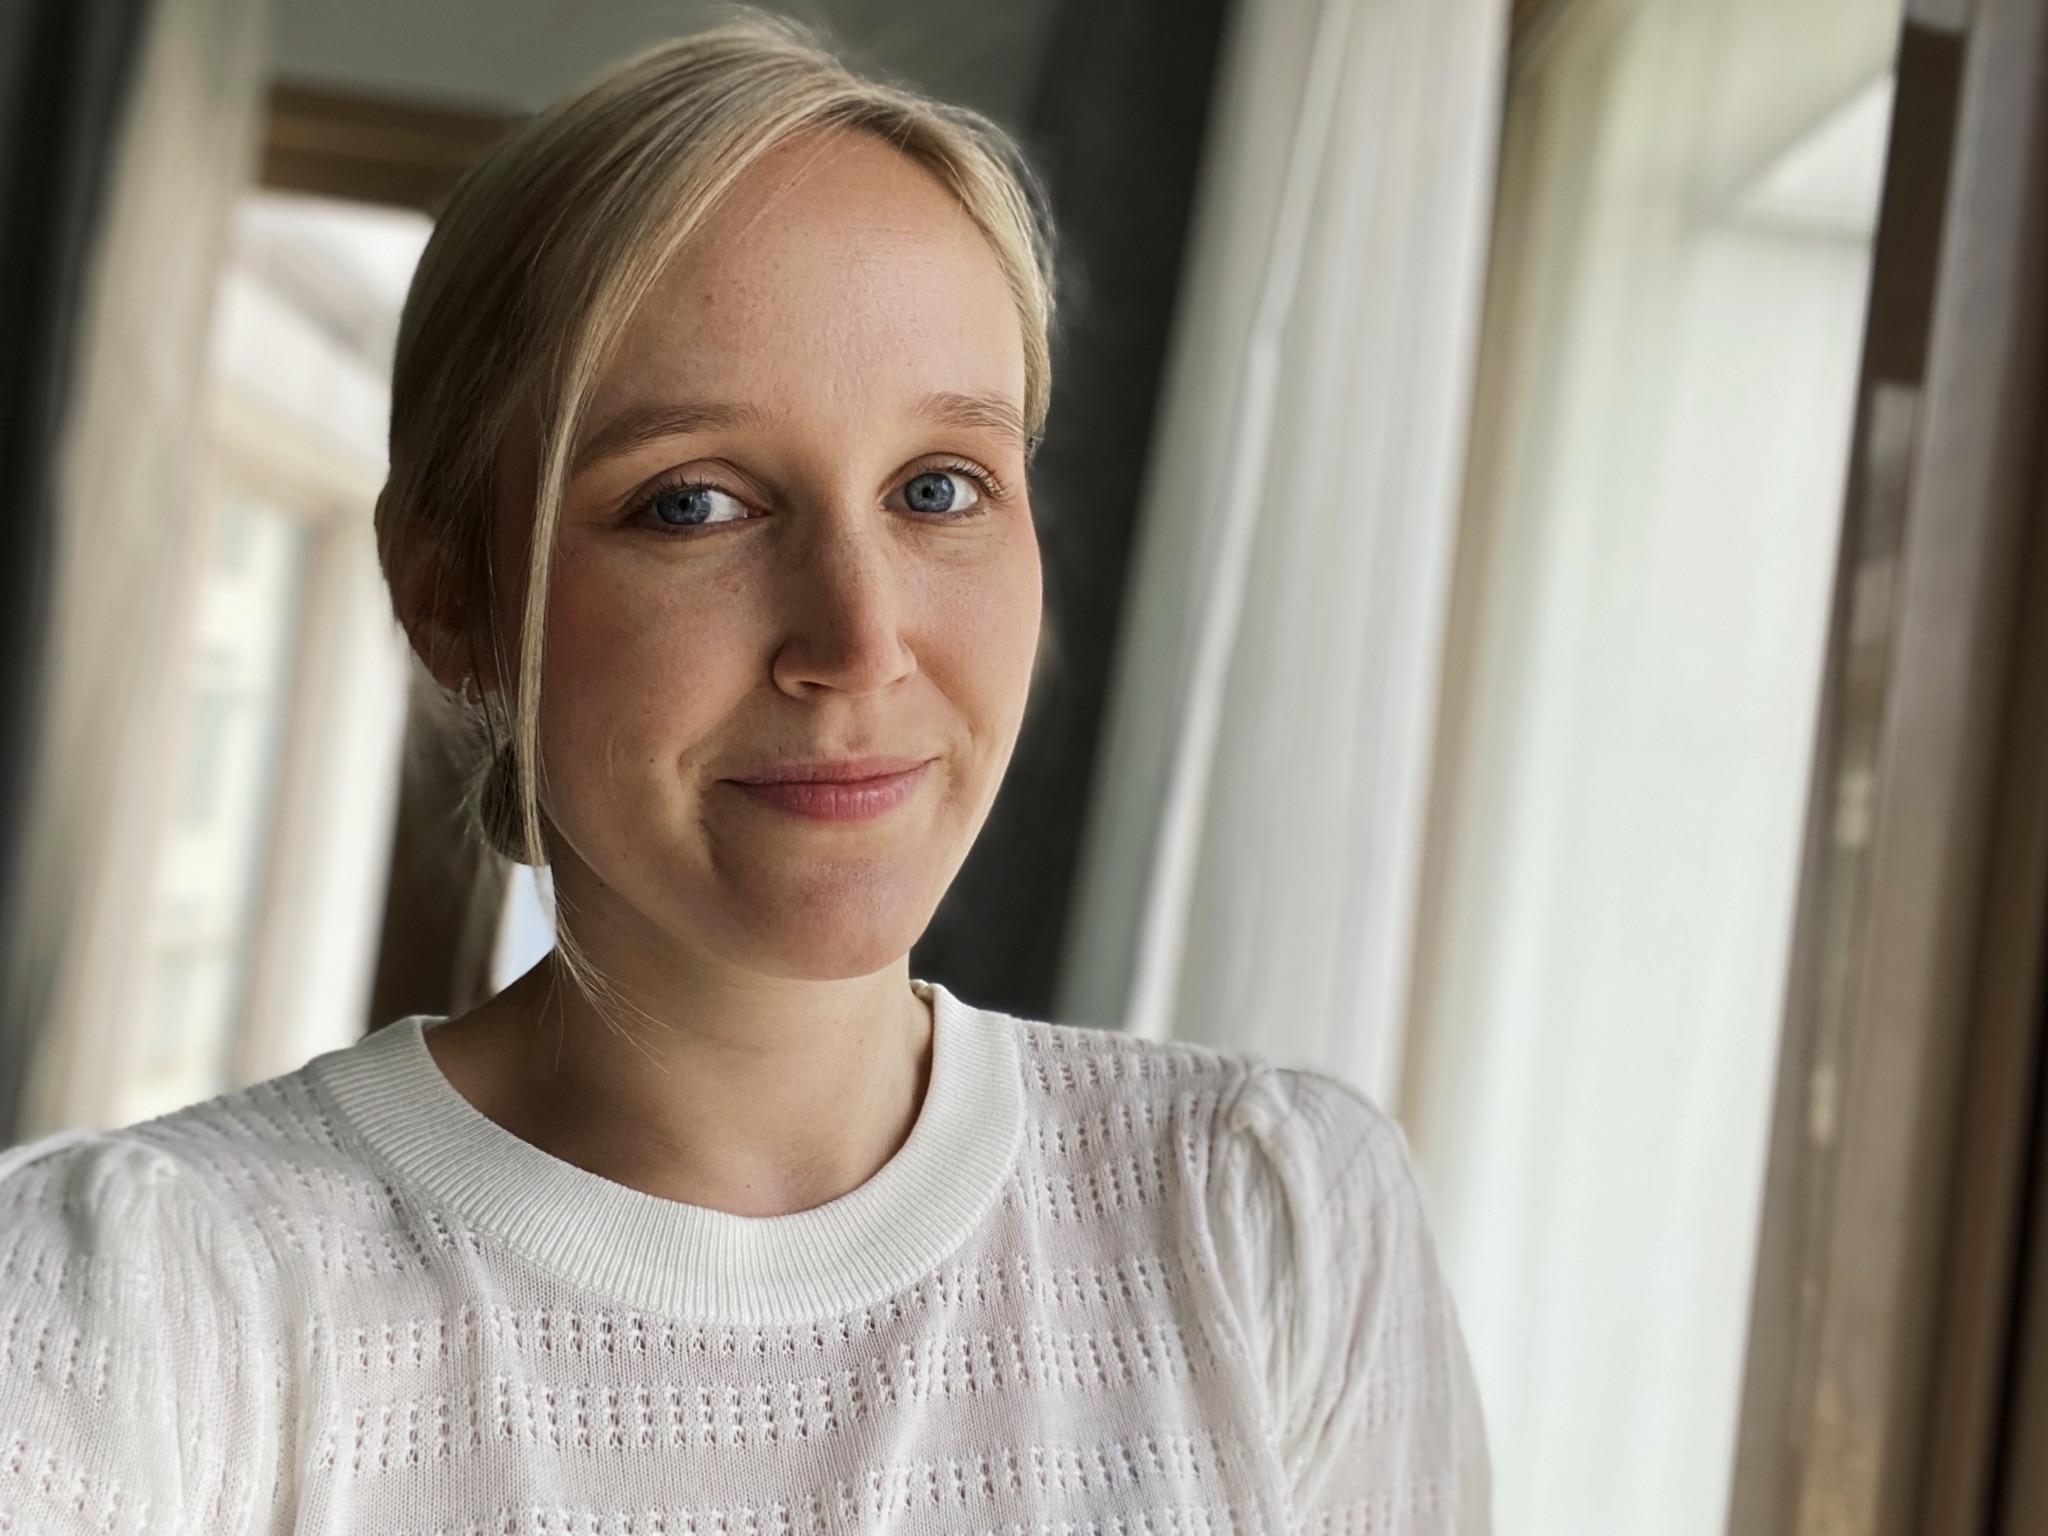 Kati Temonen